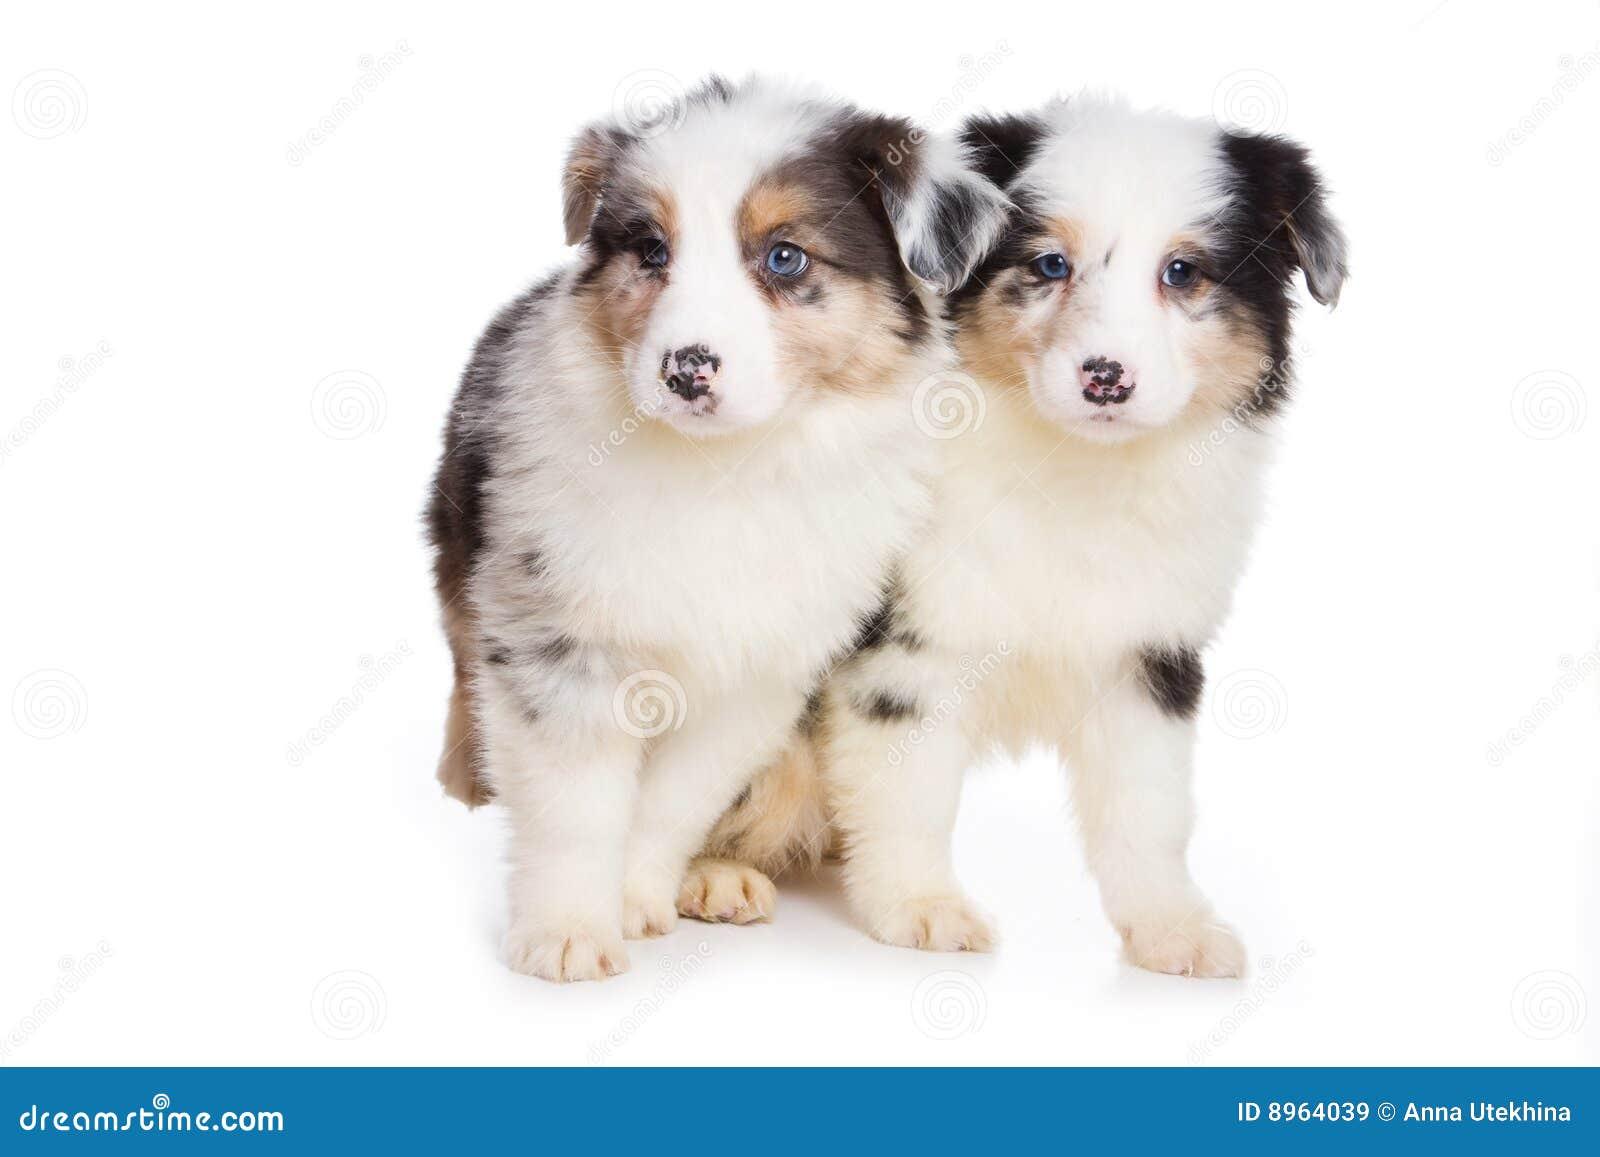 Australian Shepherd Puppy Royalty Free Stock Images - Image: 8964039